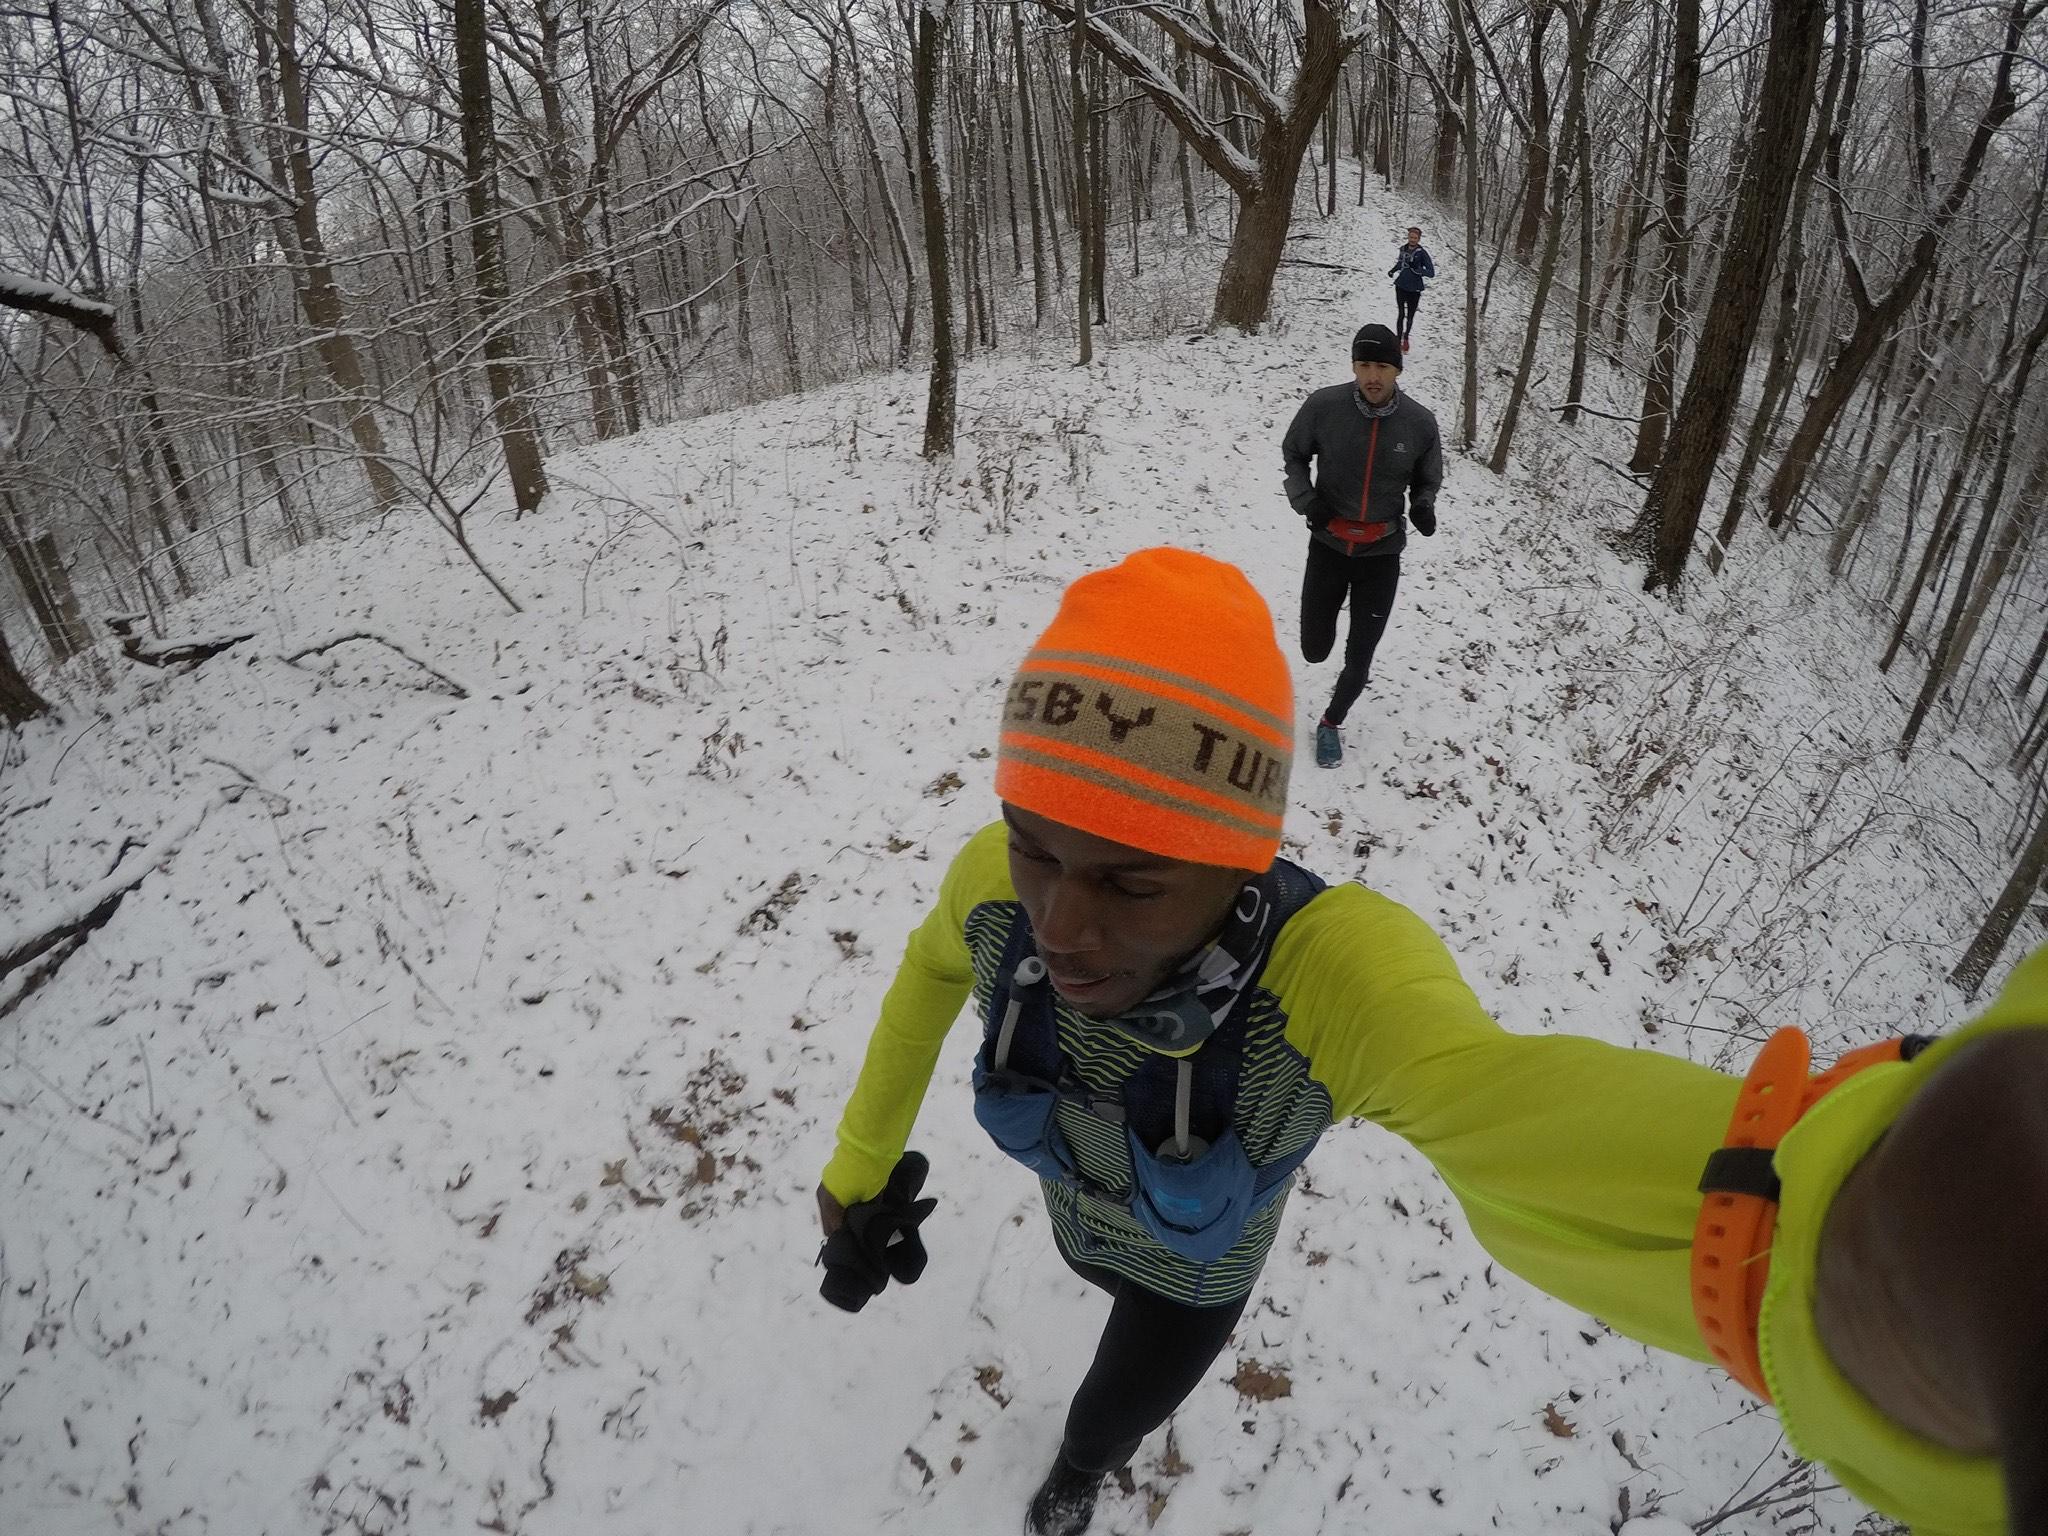 Coree-Woltering-IAT-winter-trail-running